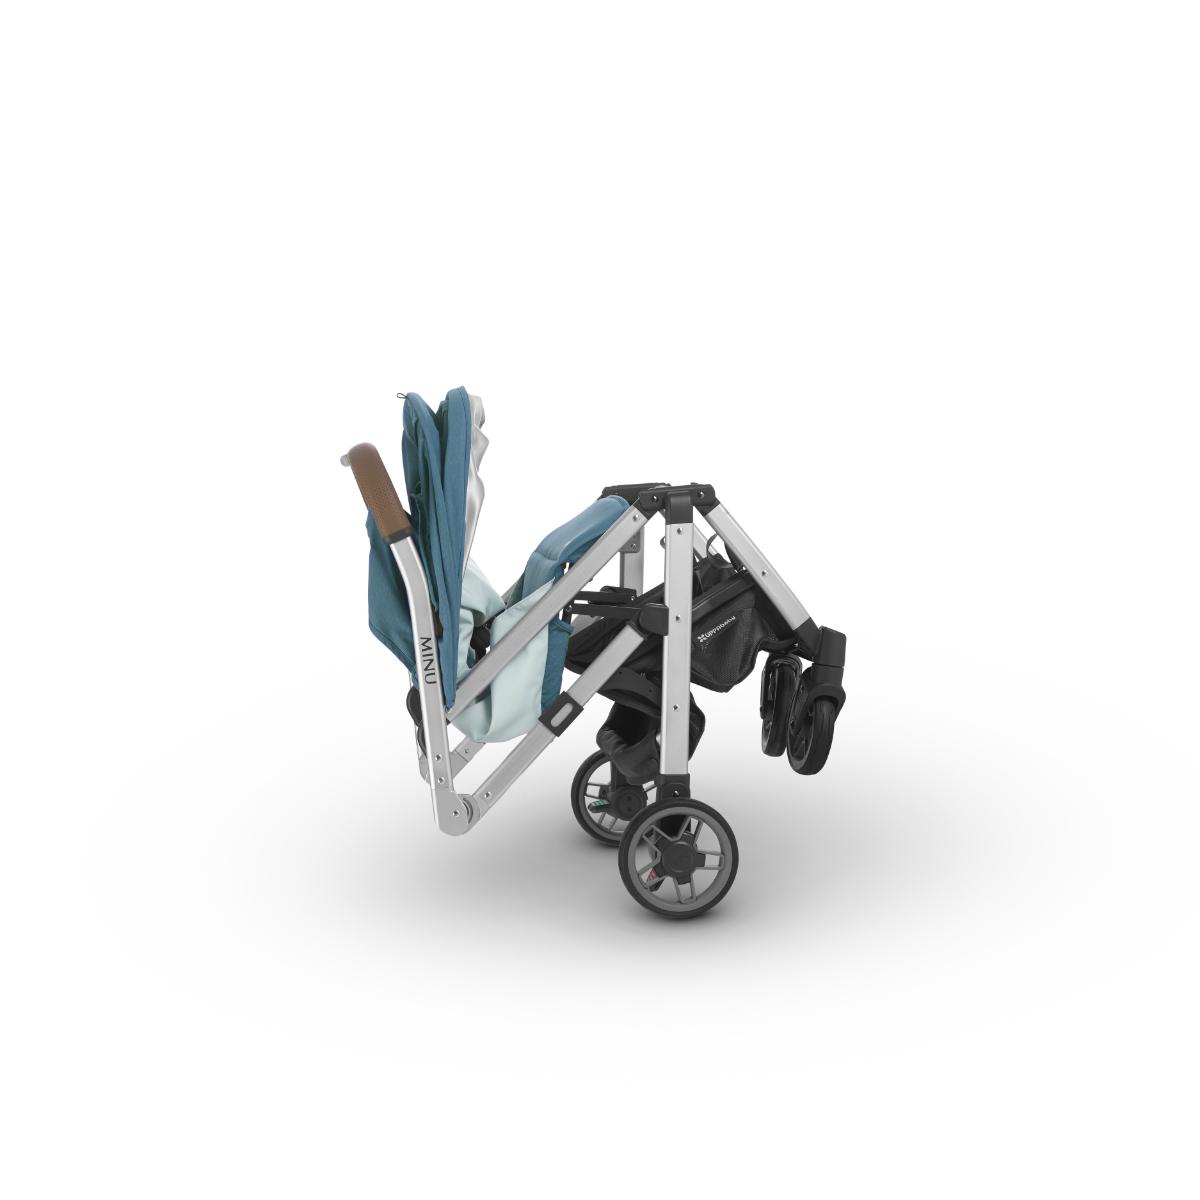 MINU18_Fold_part3-w1200-h1200